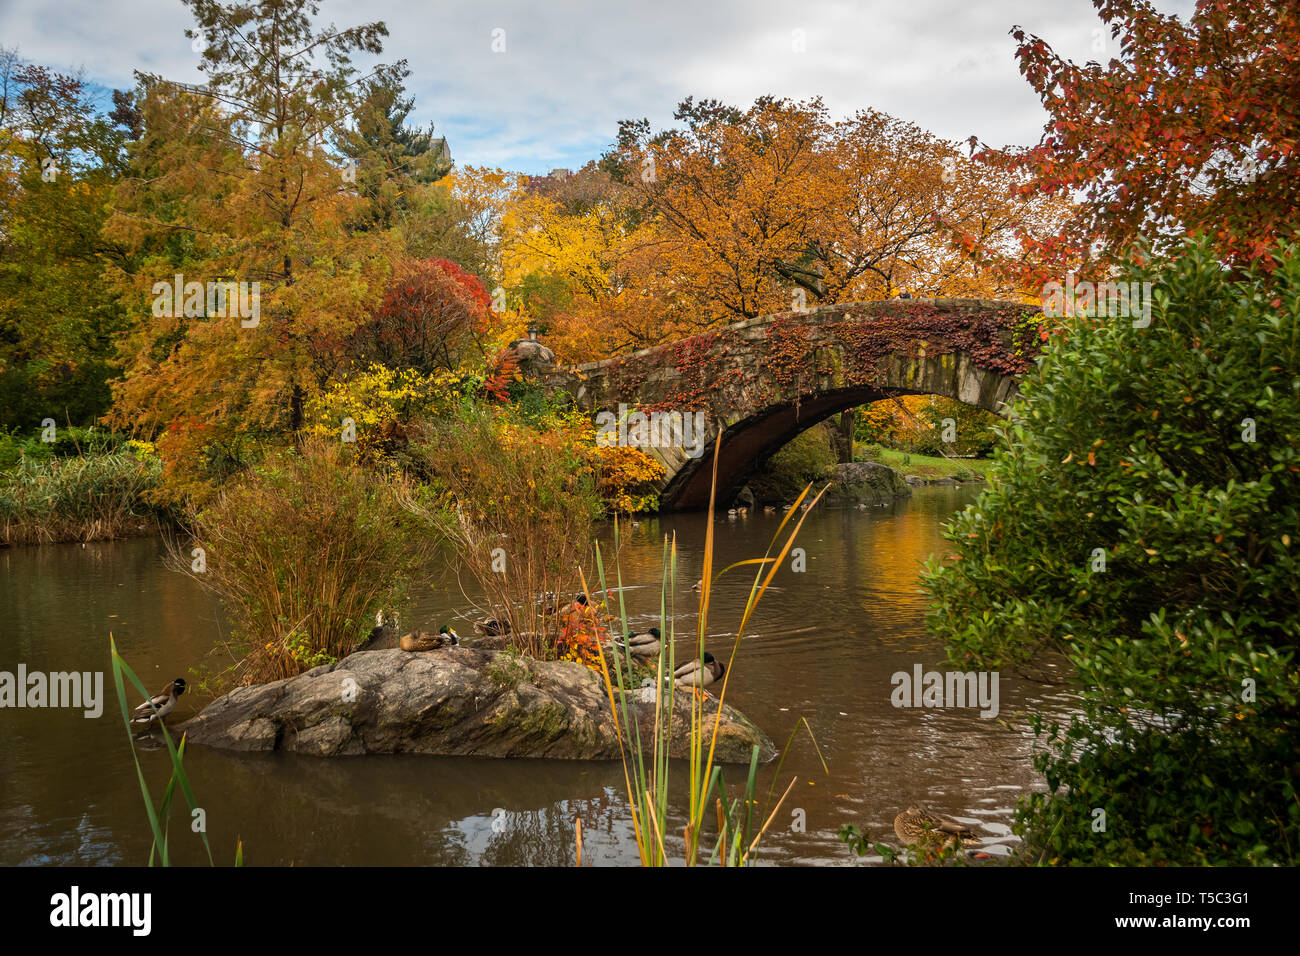 Gapstow Bridge, Central Park, in Autumn - Stock Image